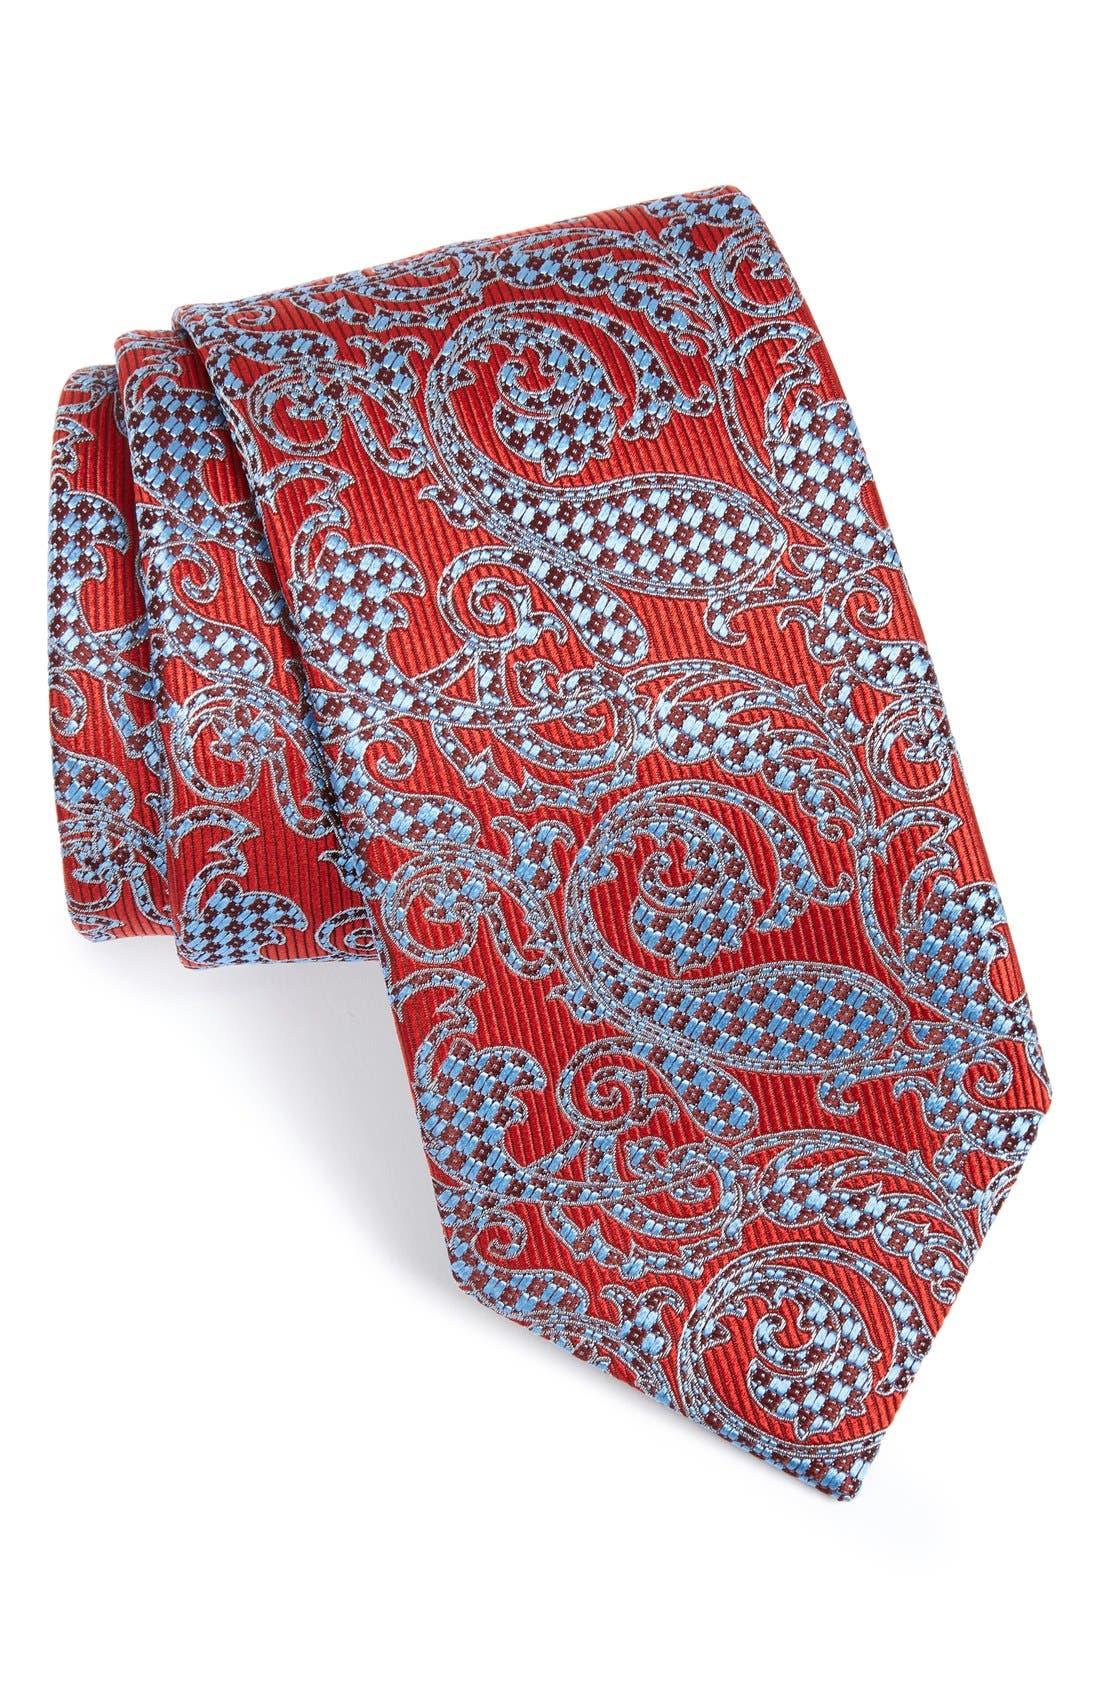 Alternate Image 1 Selected - Ermenegildo Zegna Paisley Silk Tie